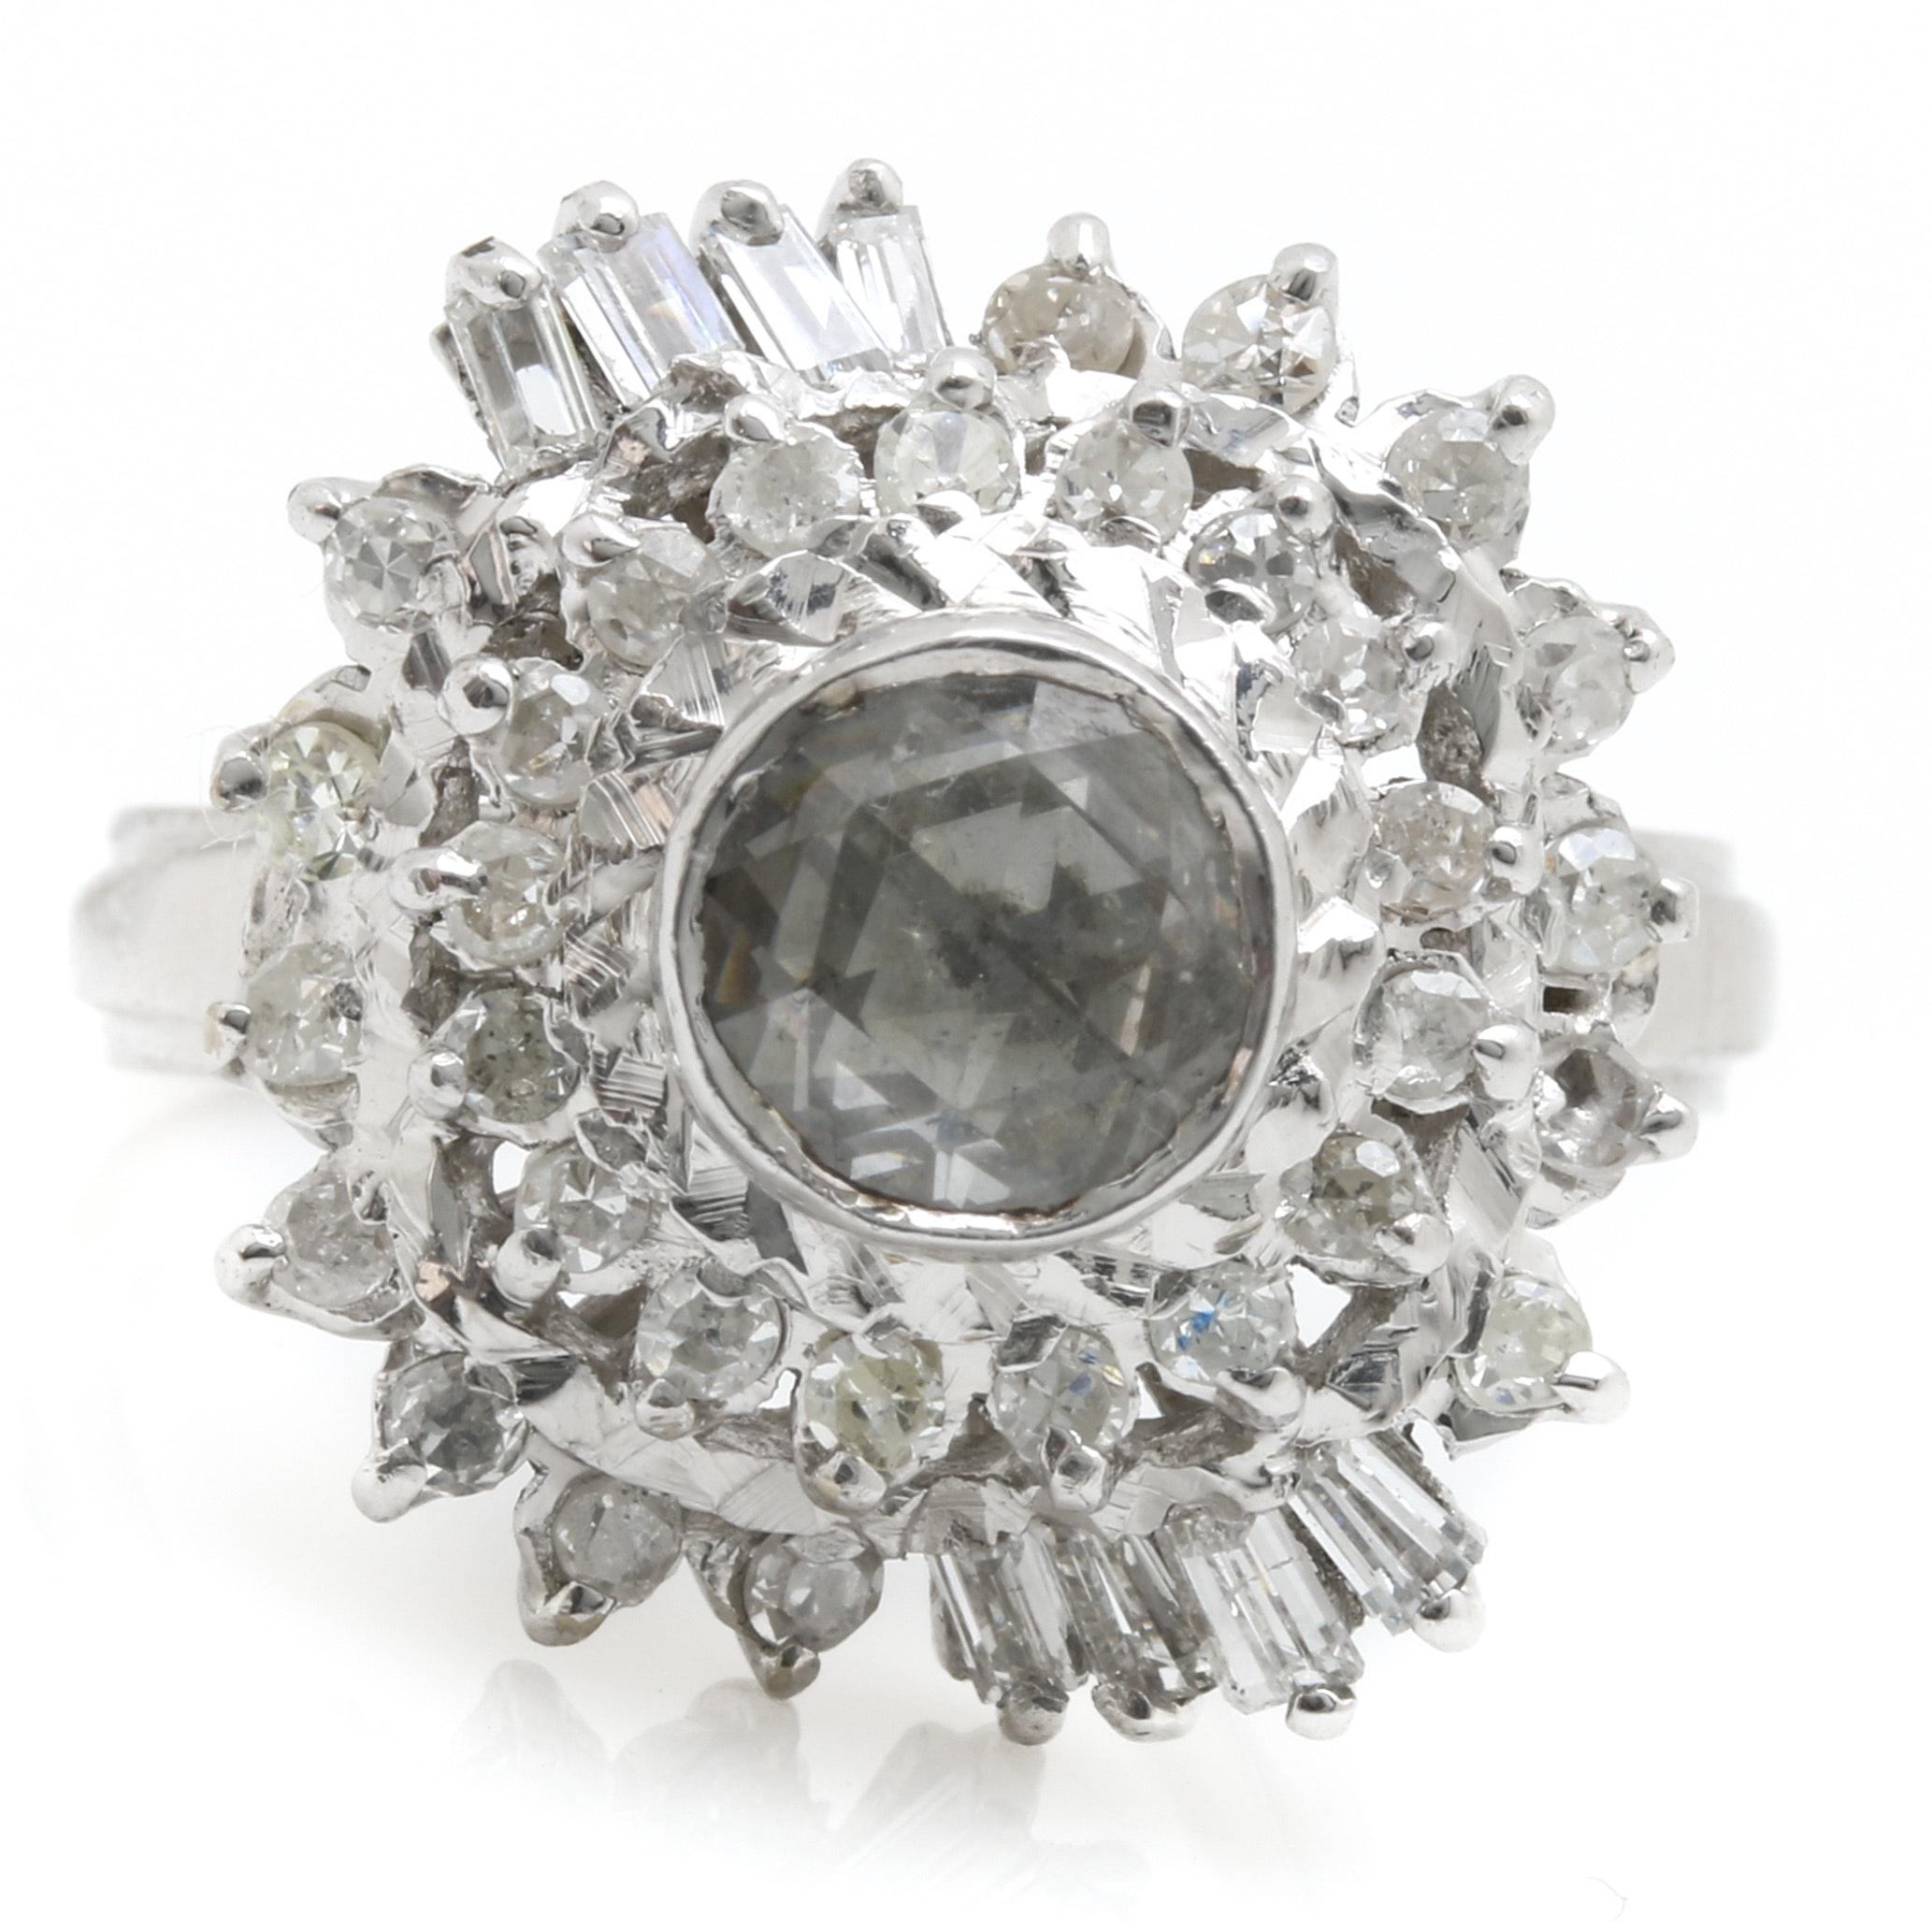 18K White Gold Rose Cut Diamond Cocktail Ring